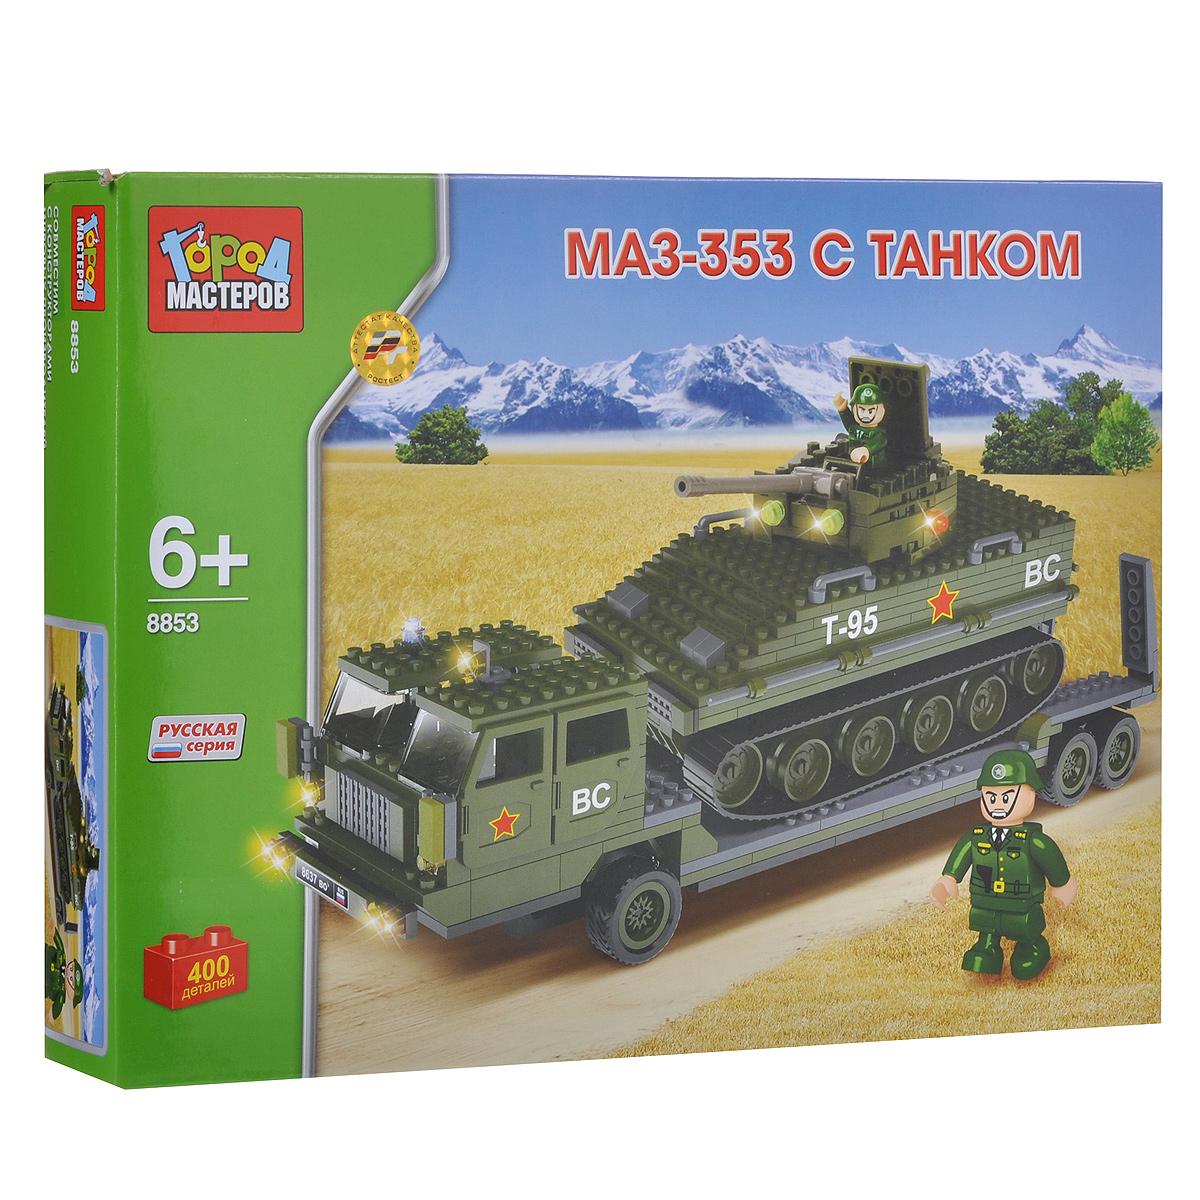 Город Мастеров Конструктор МАЗ-353 с танком бу маз в беларуси